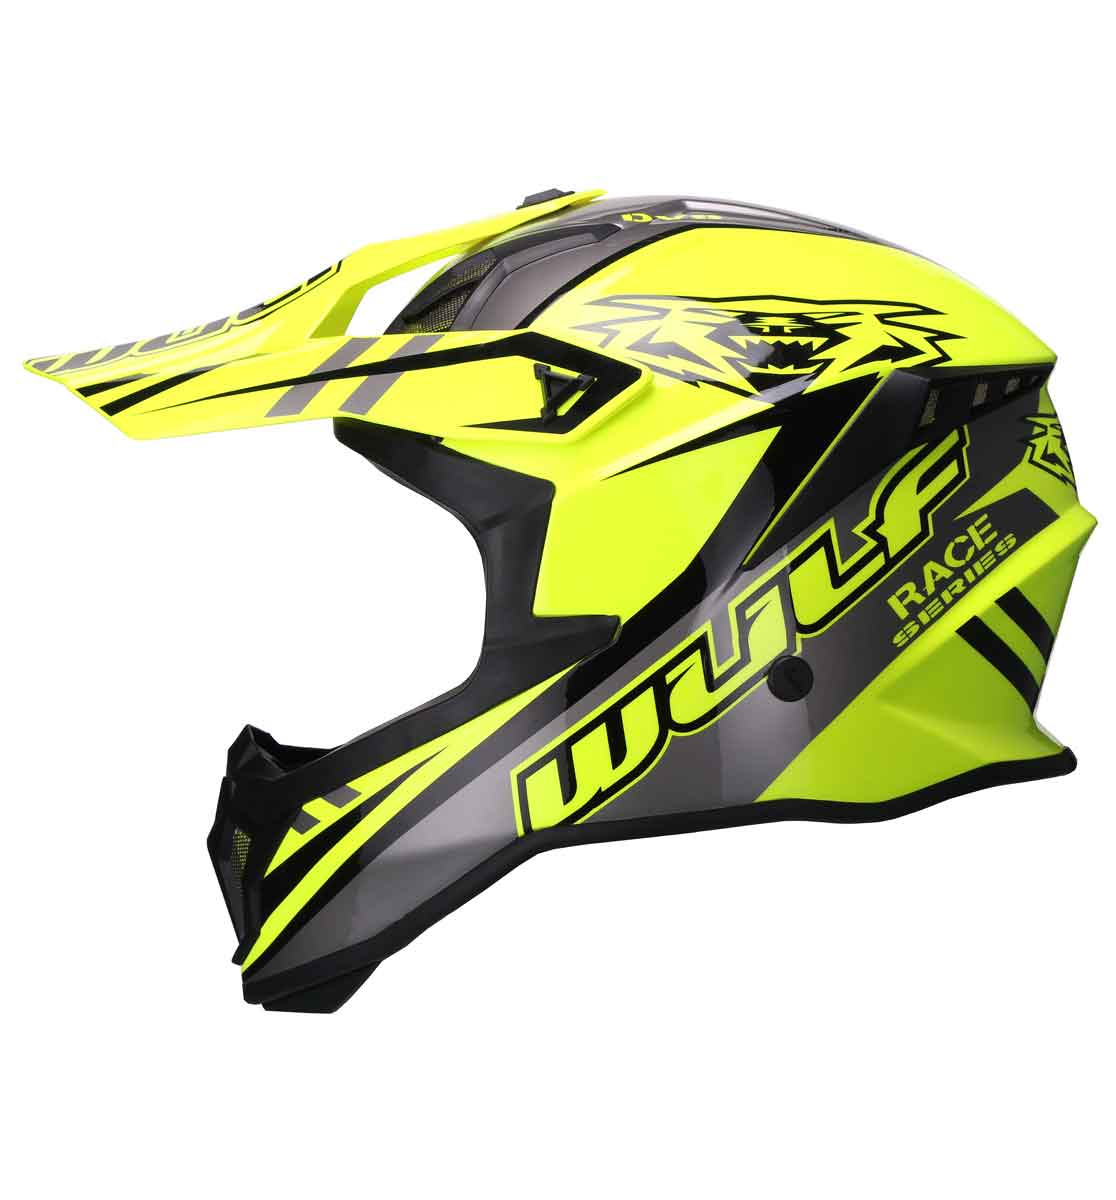 Wulfsport Race Series Helmet | Yellow | XL (61-62cm)